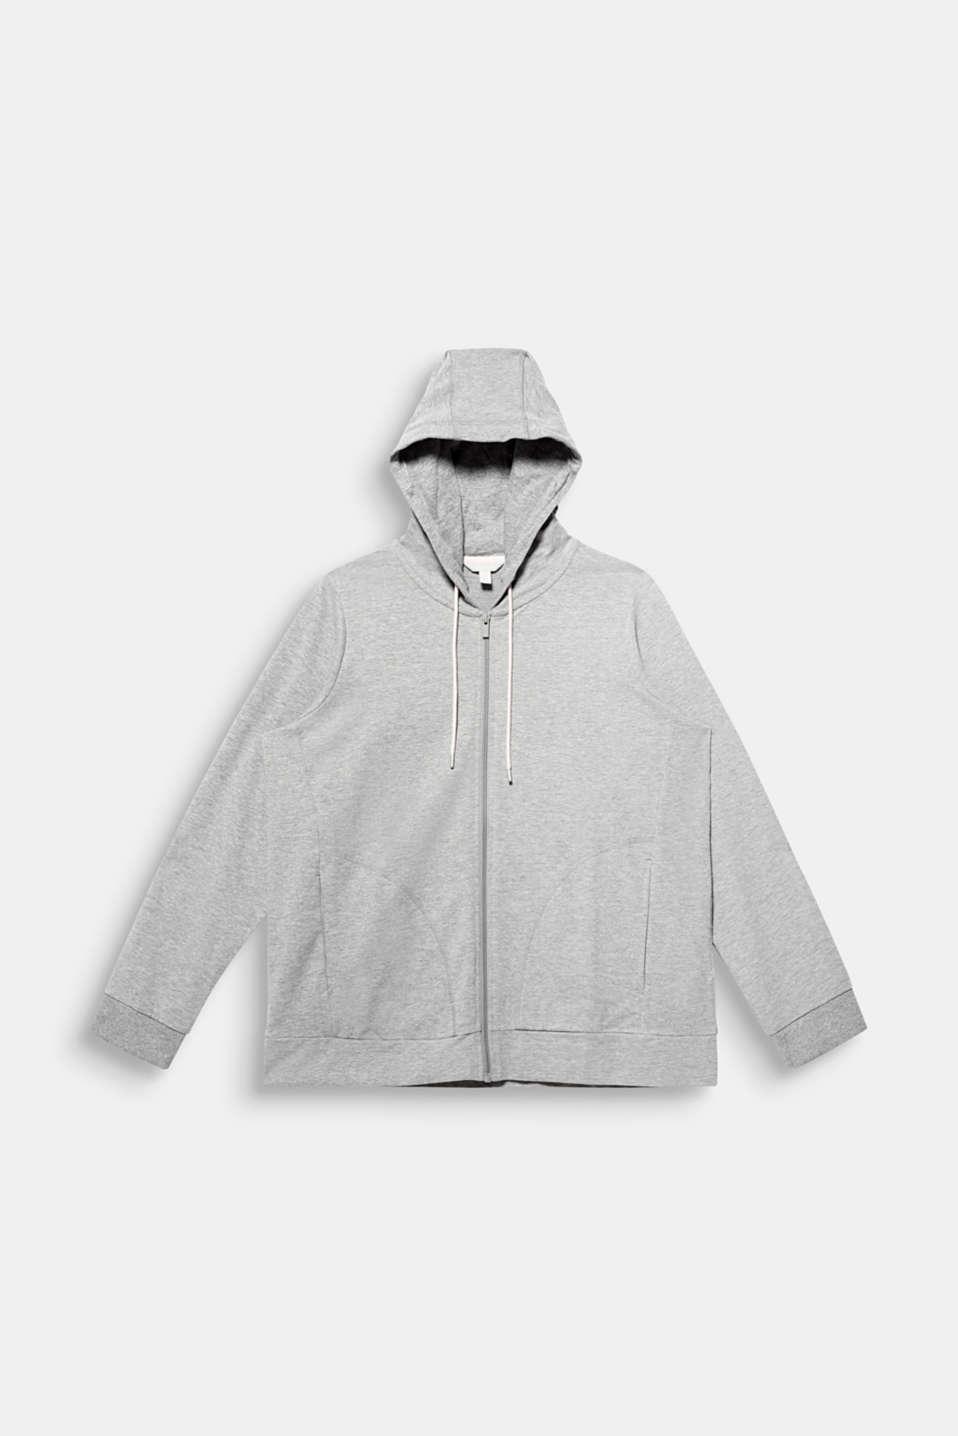 NEW YEAR. NEW ME. Hooded sweatshirt cardigan, MEDIUM GREY 2, detail image number 8